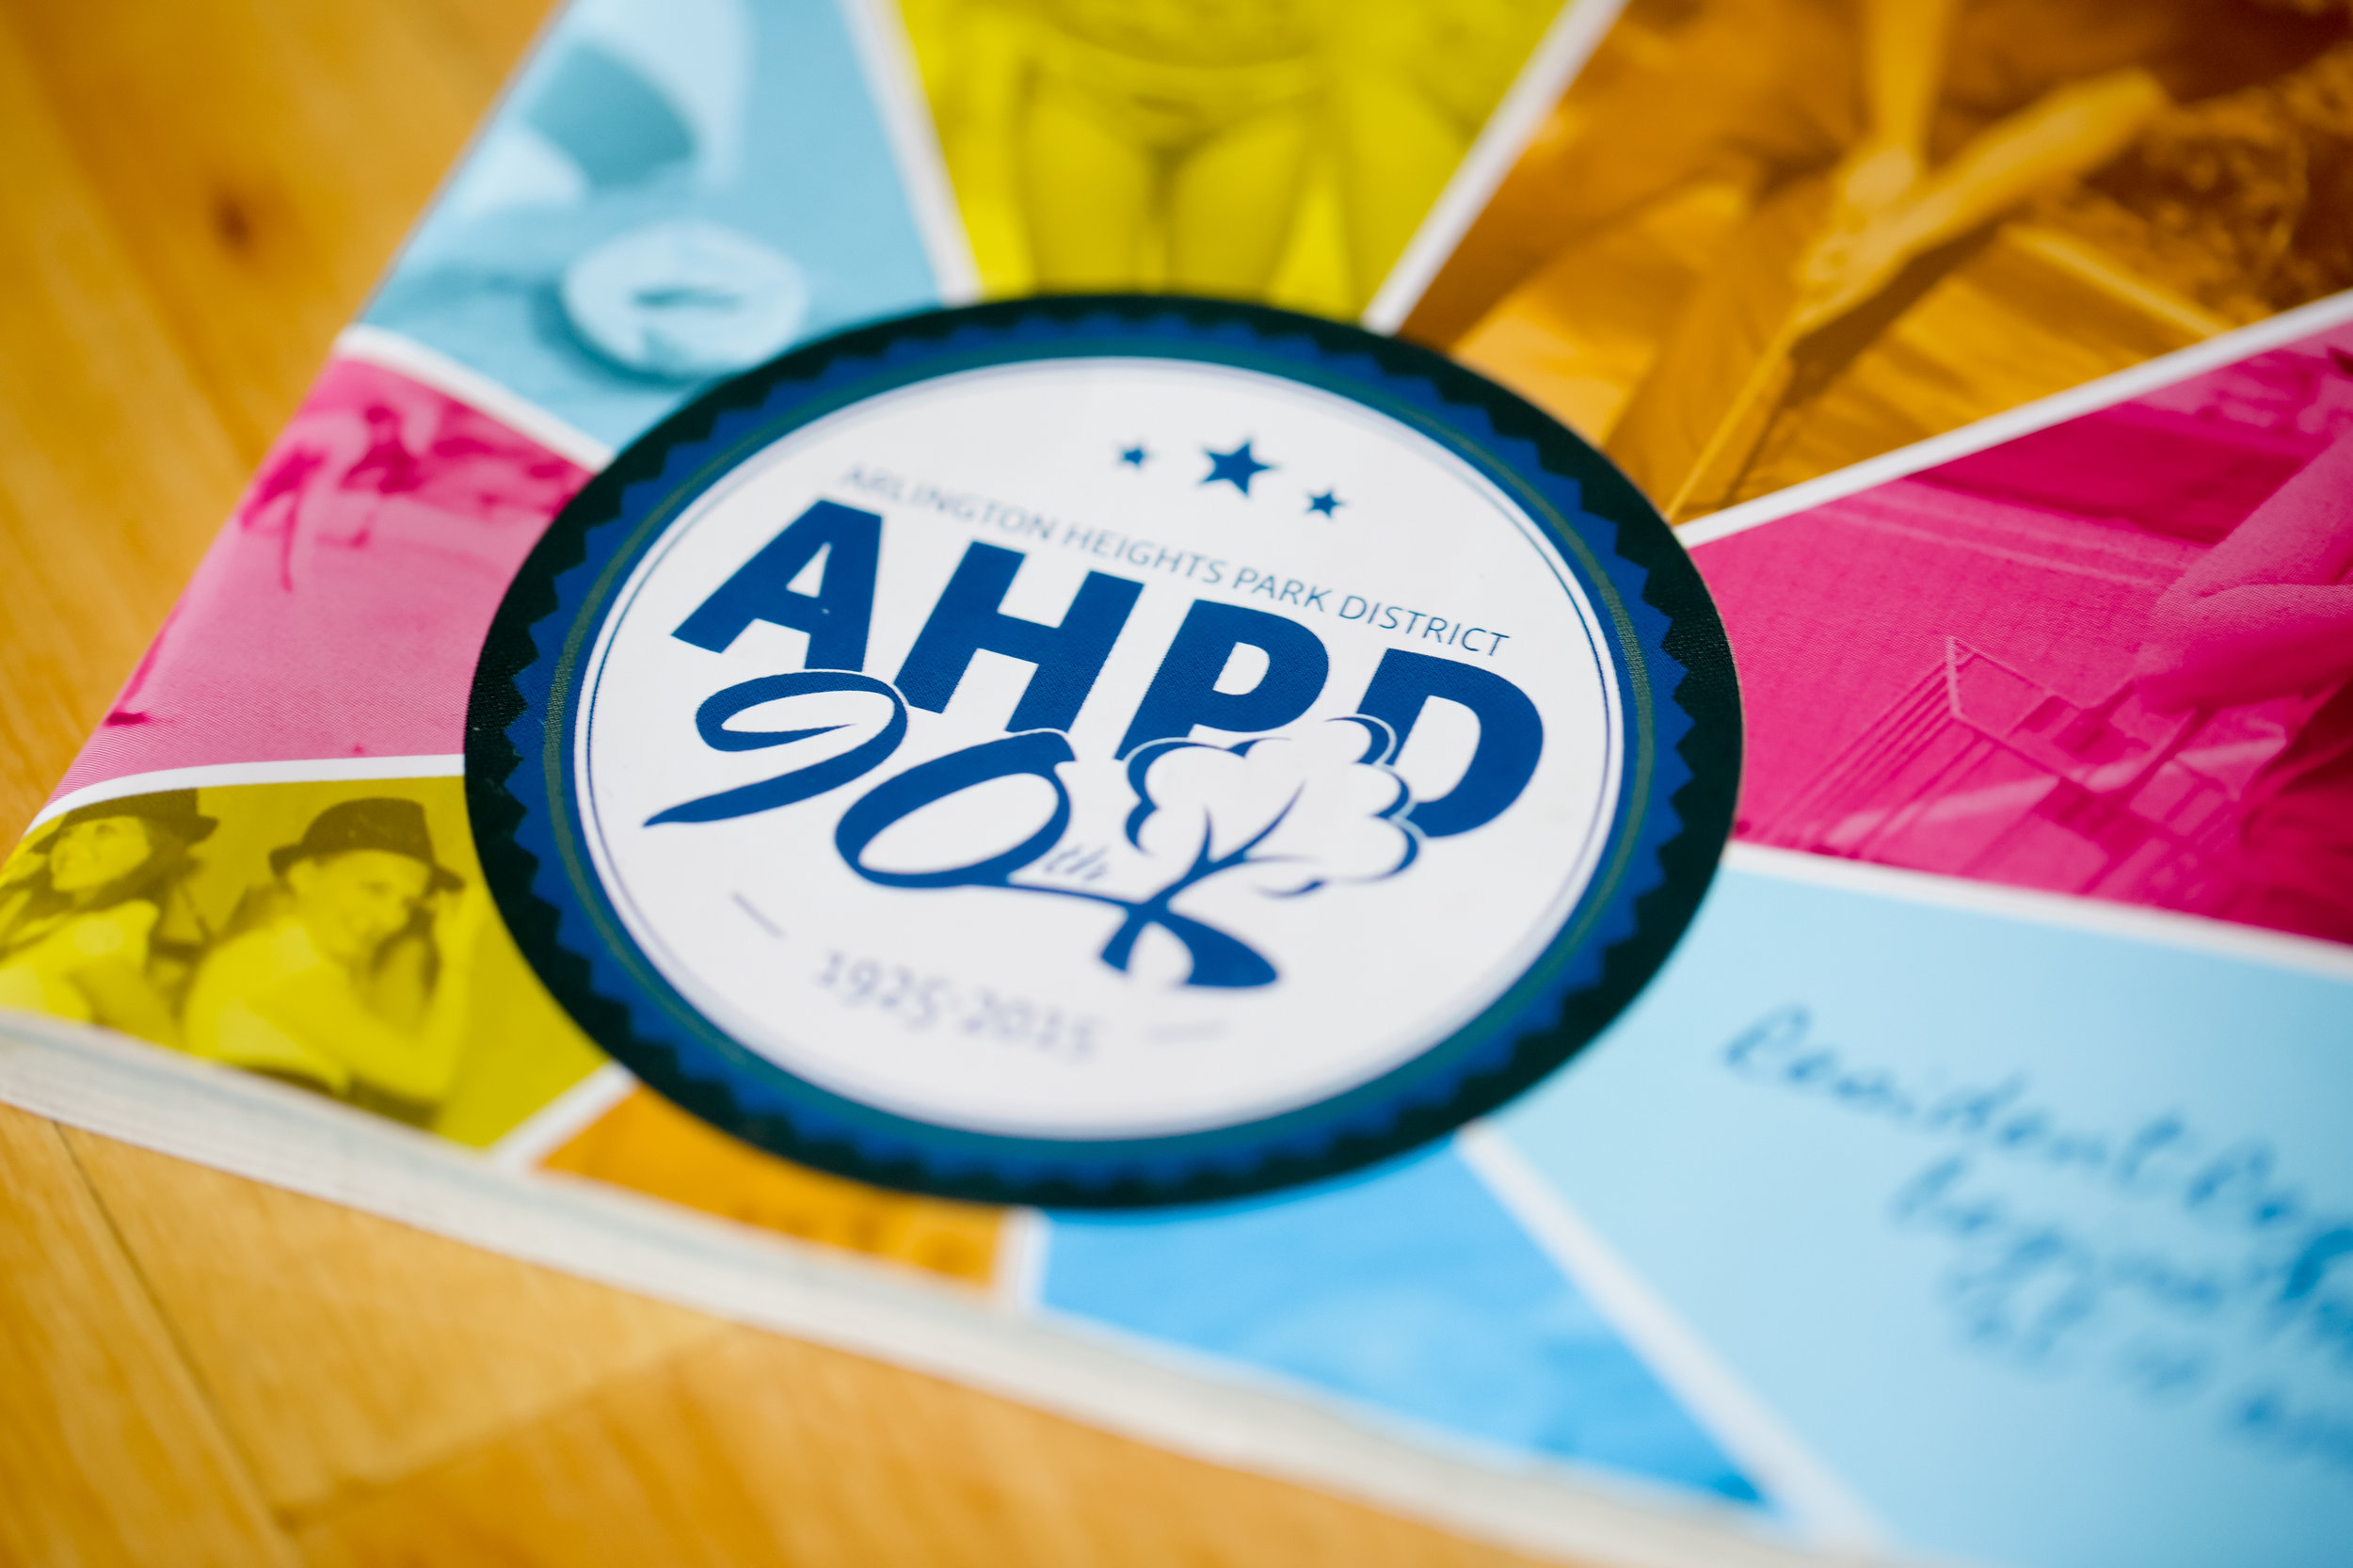 AHPD-425.jpg